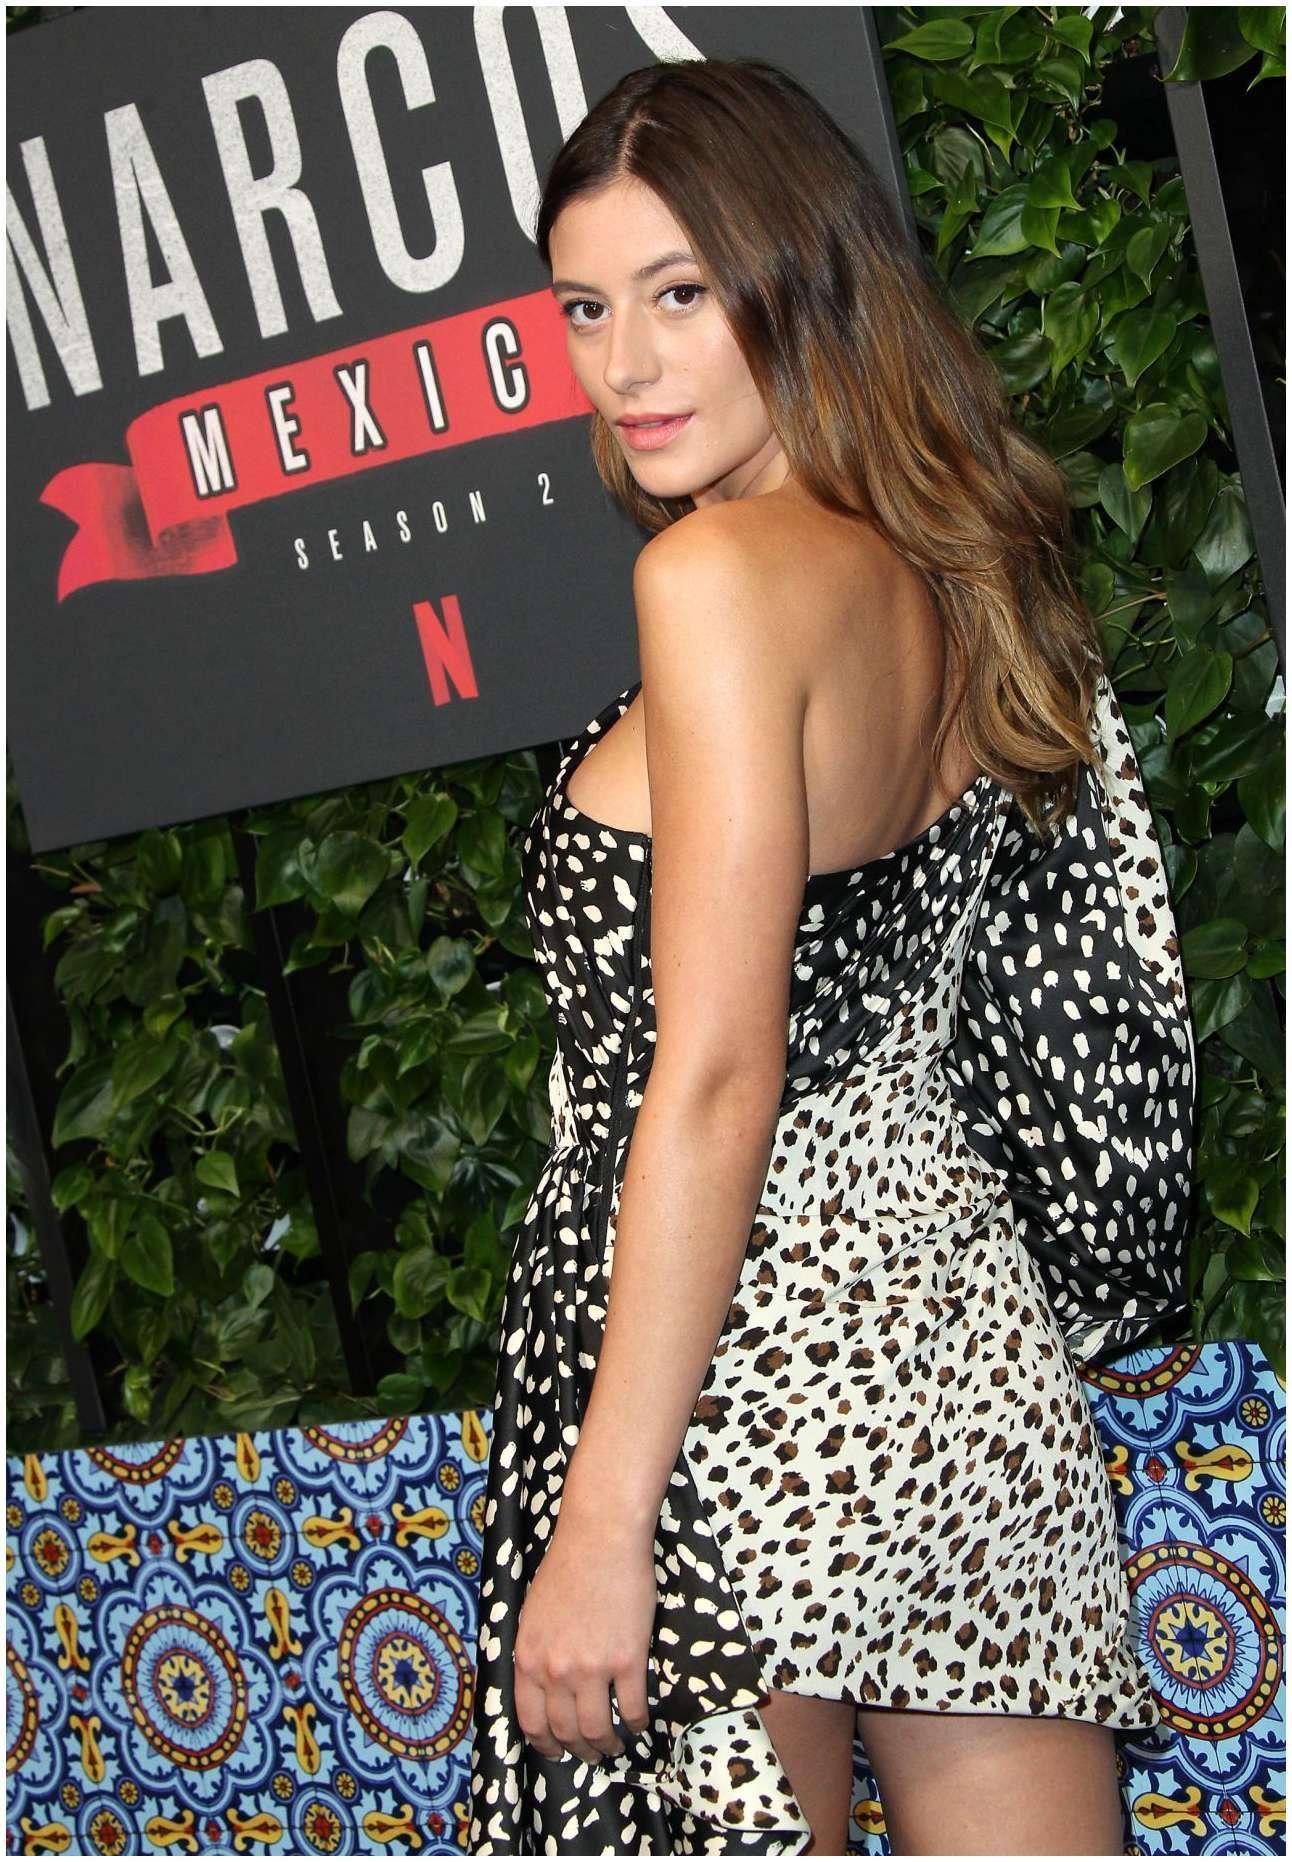 Alejandra Guilmant Narcos Mexico Tv Show Season2 Special Screening Red Carpet Fashion Tv Shows Celebrity Photos